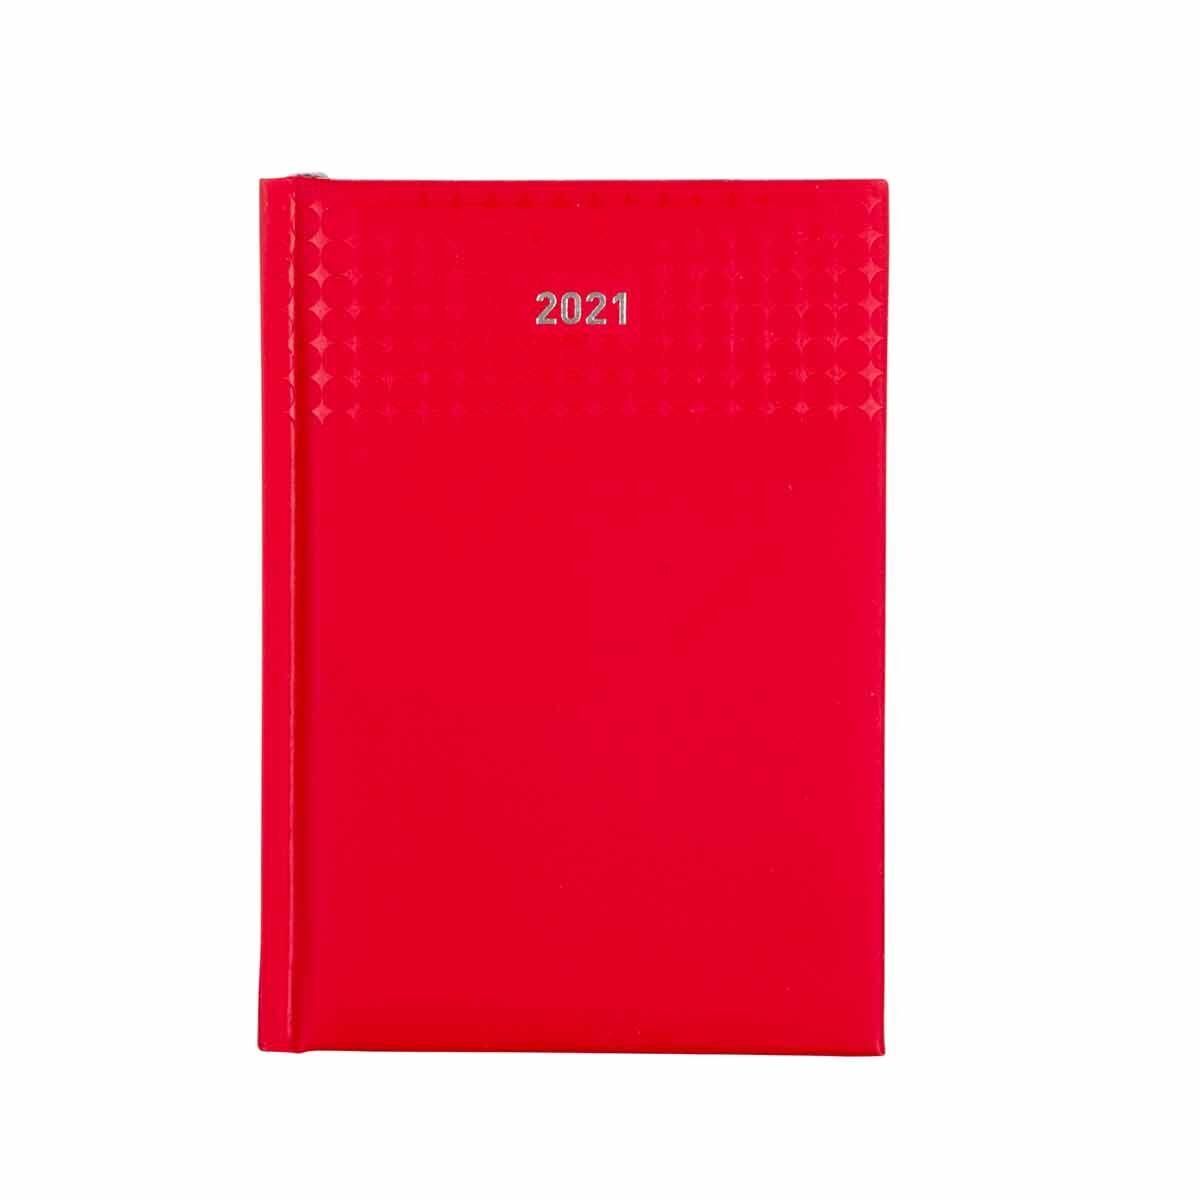 Ryman Langham Diary Week to View A6 2021